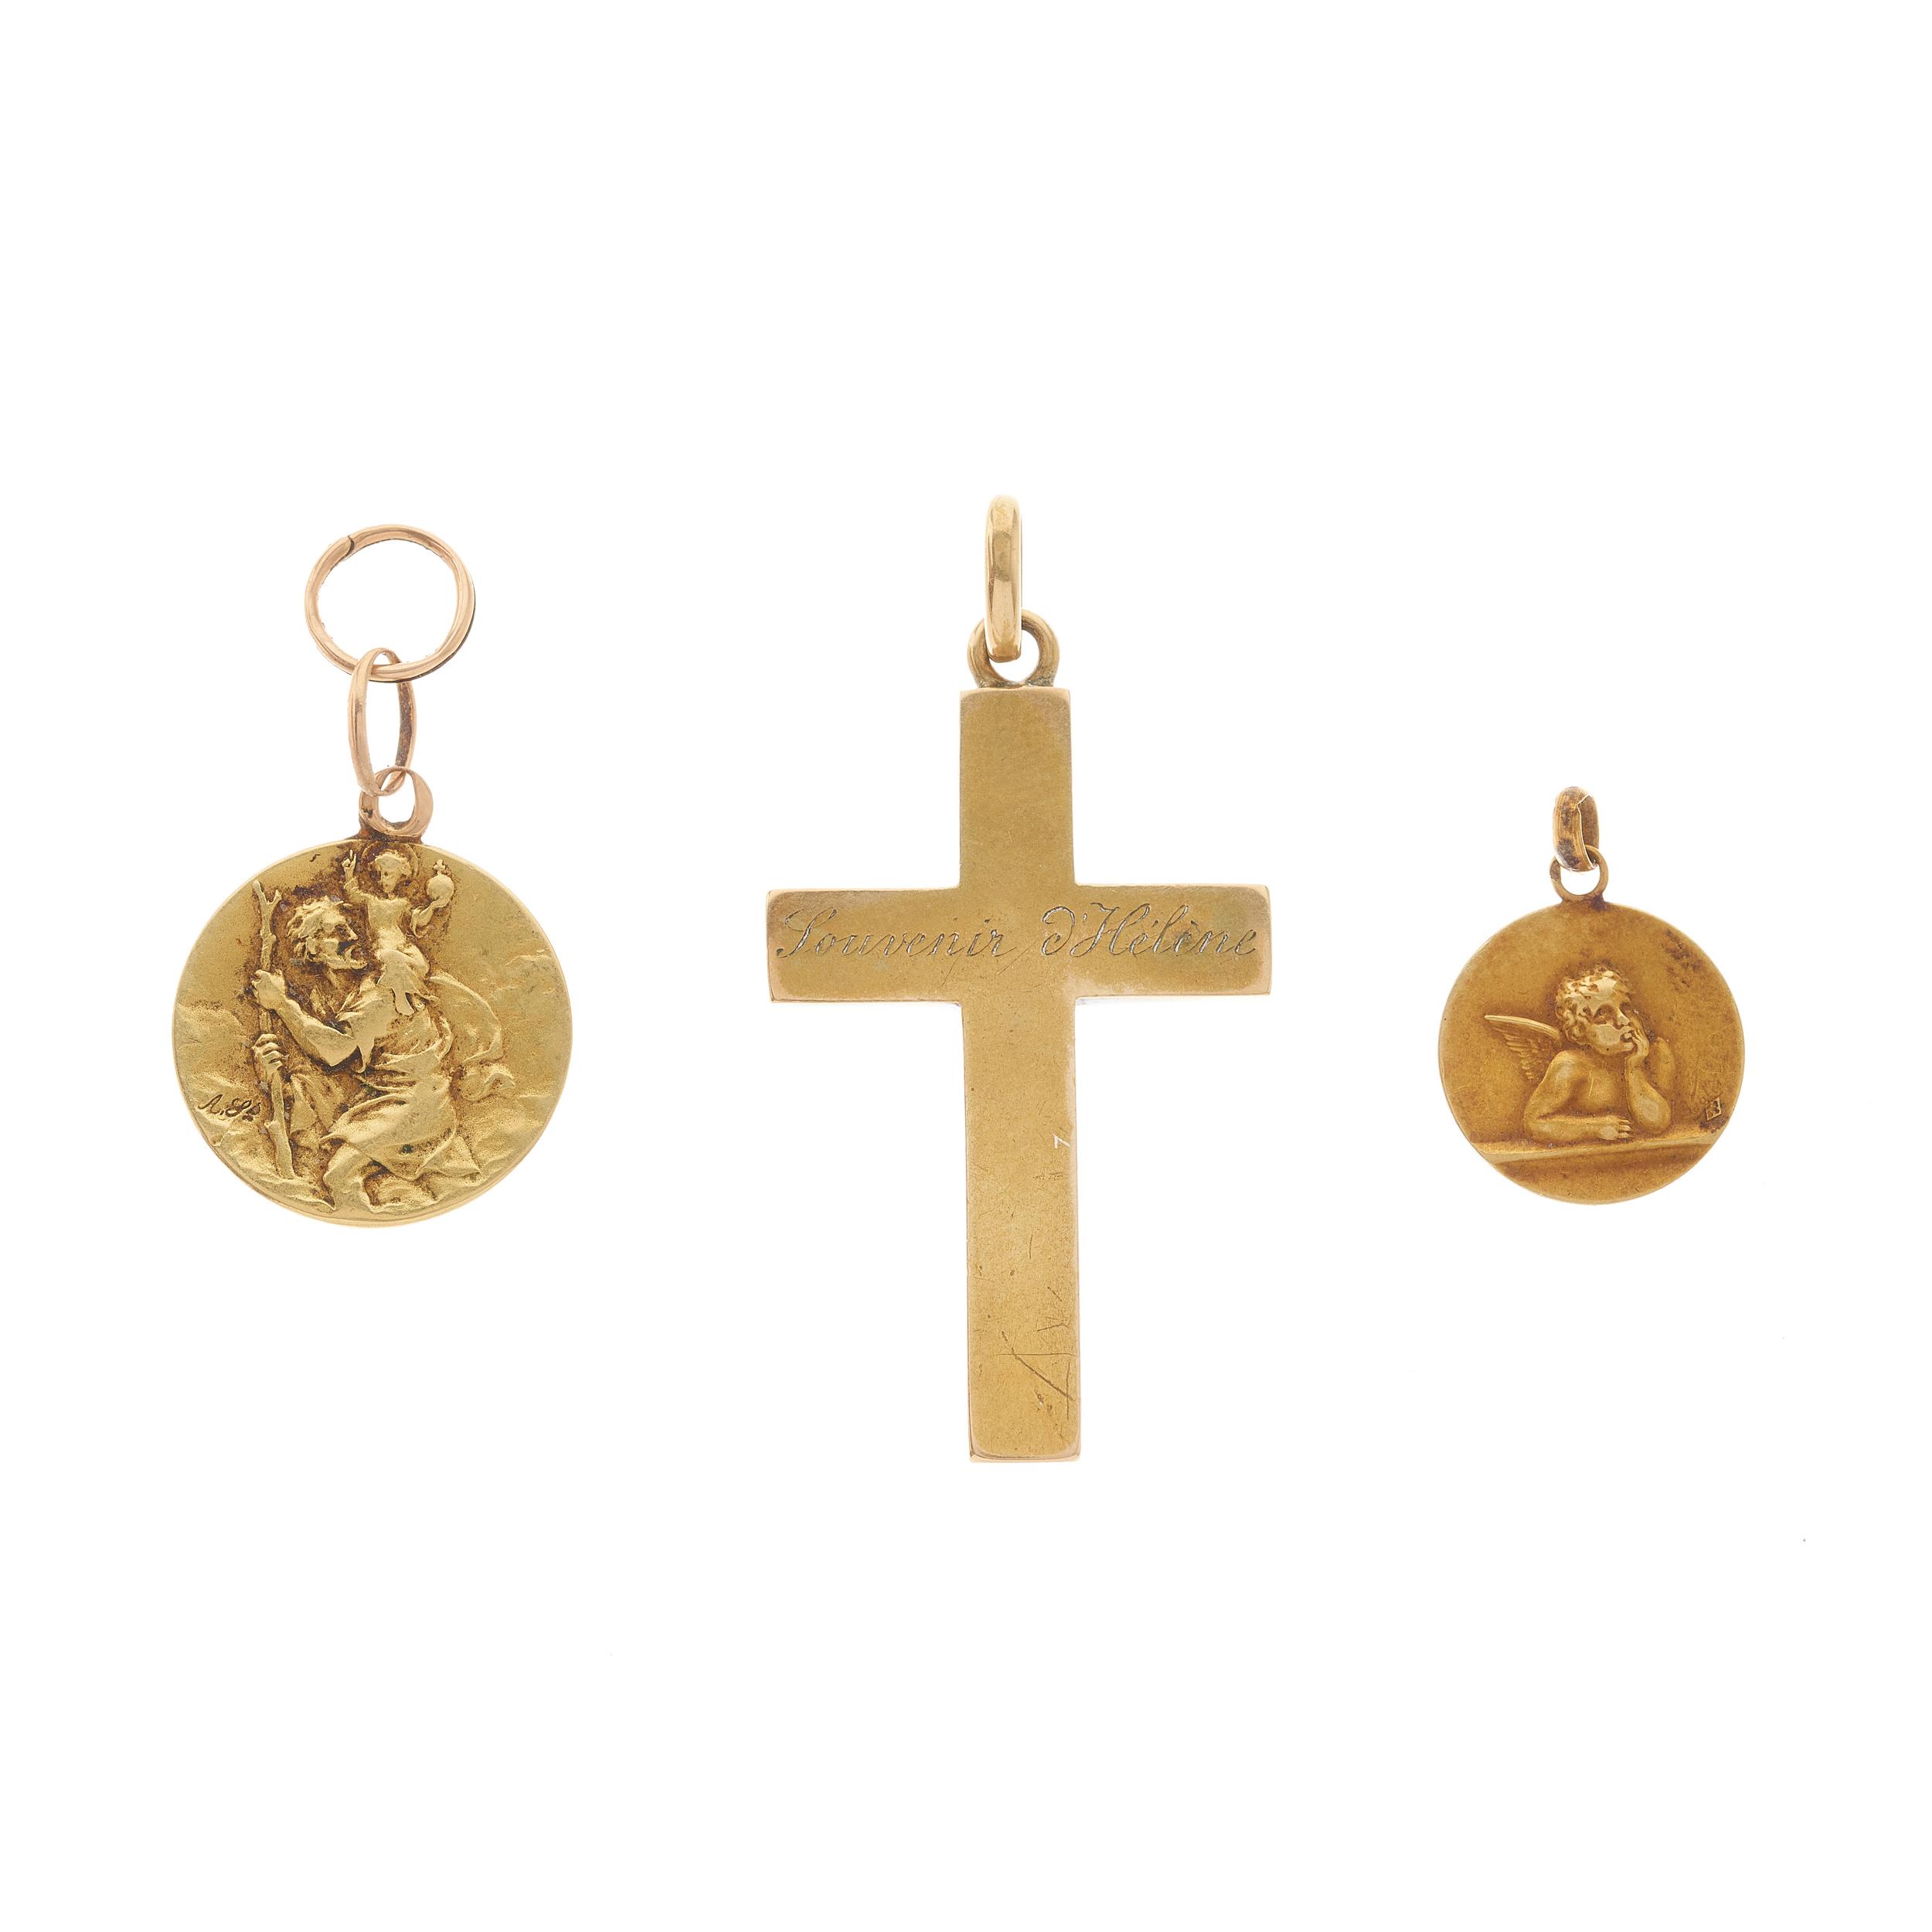 Three early 20th century gold pendants